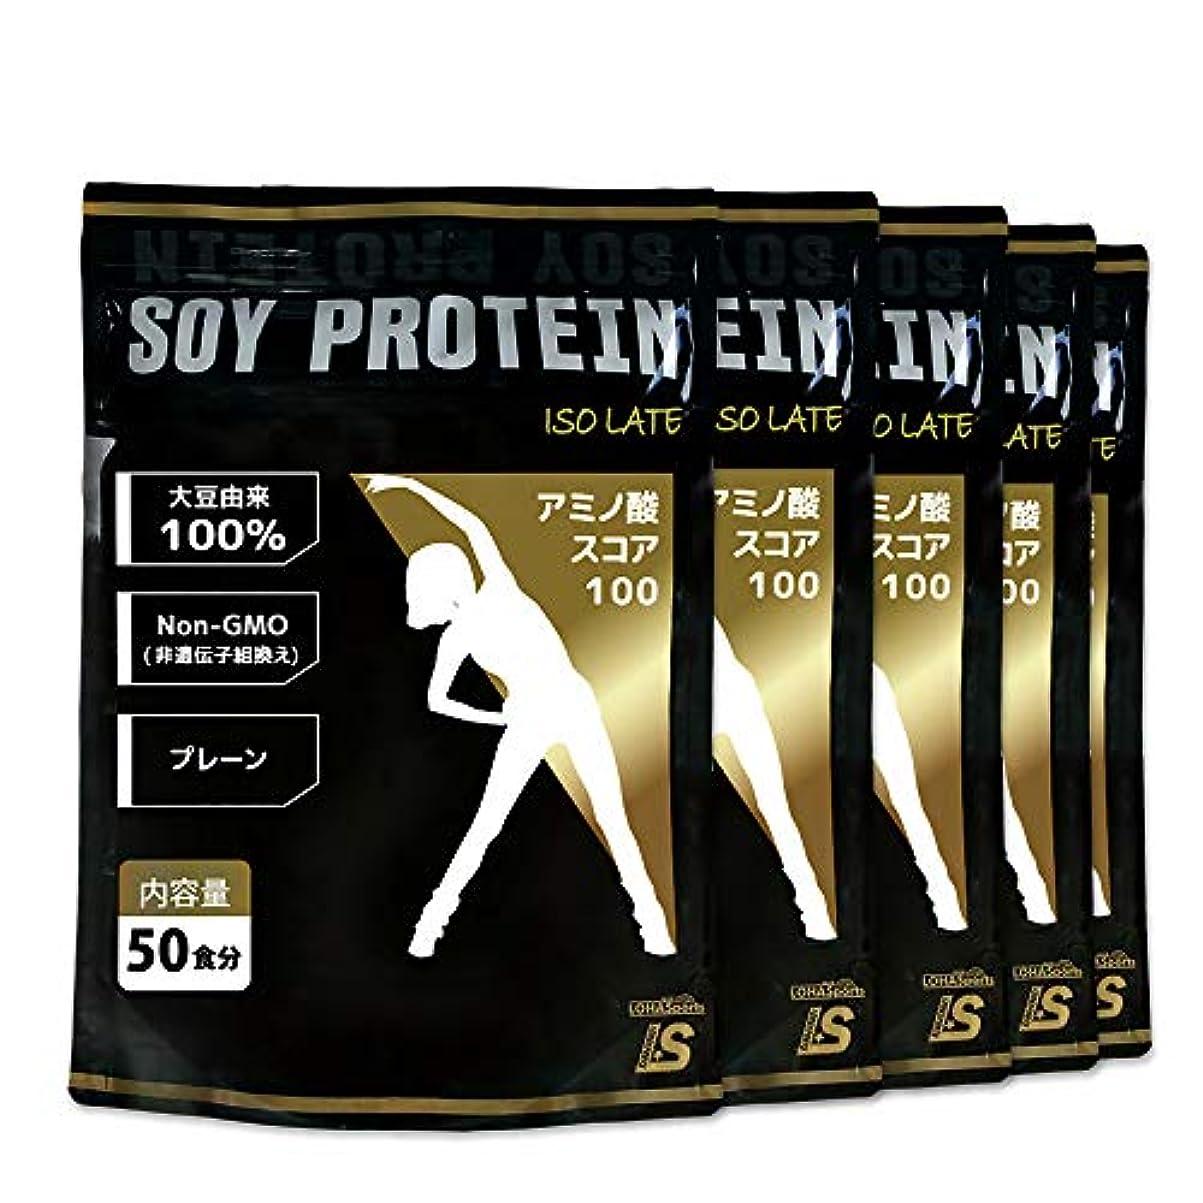 LOHAStyle ソイプロテイン 大豆プロテイン 無添加 ((5kg(1kg×5袋)) 約250食分) アミノ酸スコア100 [非遺伝子組み換え]